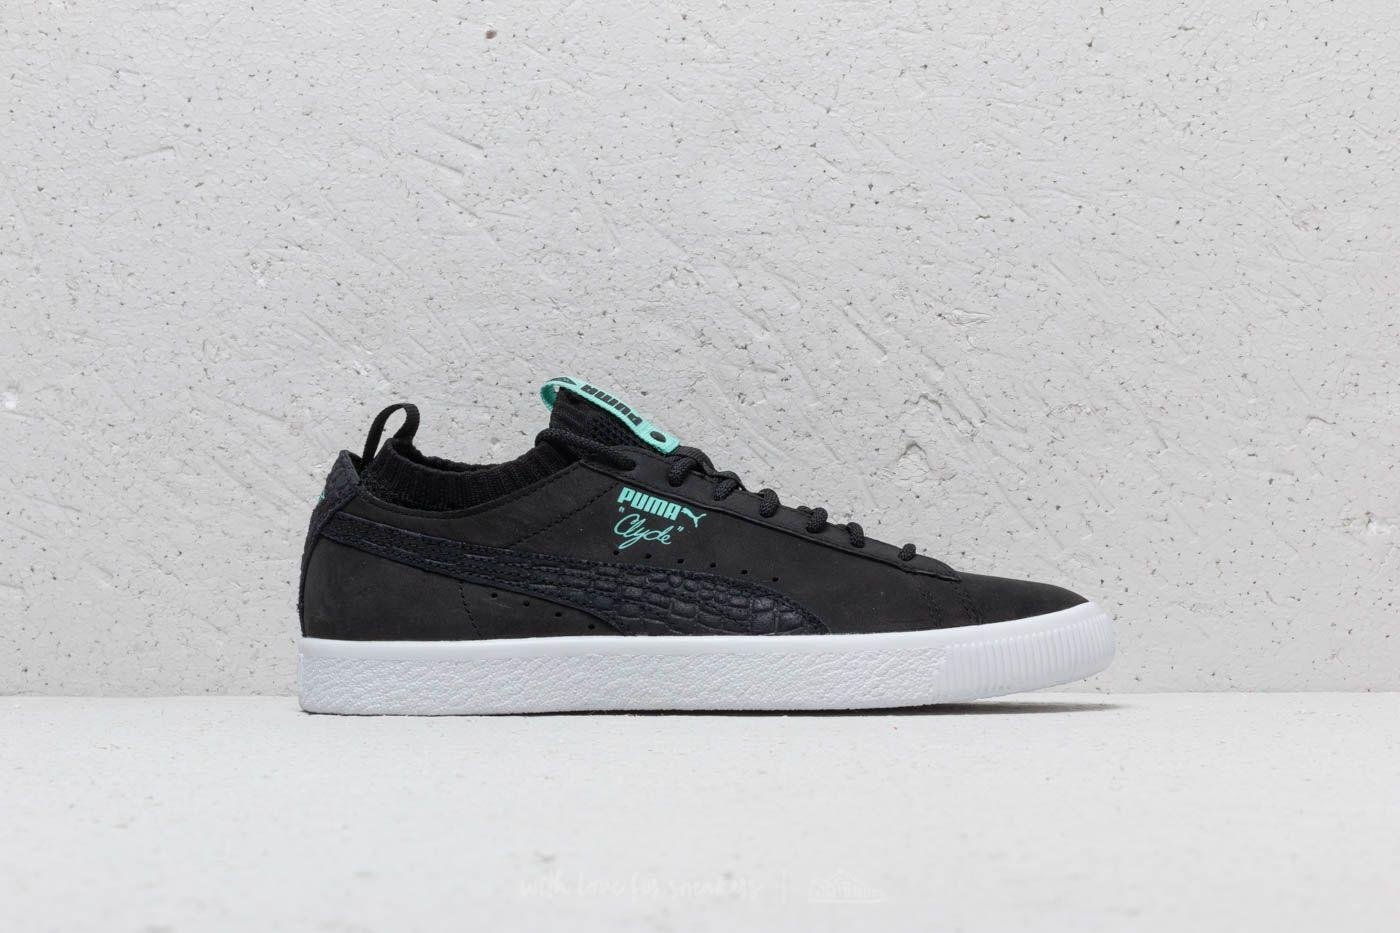 new style 4f5cd b0b54 Puma x Diamond Clyde Sock Low Puma Black/ Puma Black | Footshop